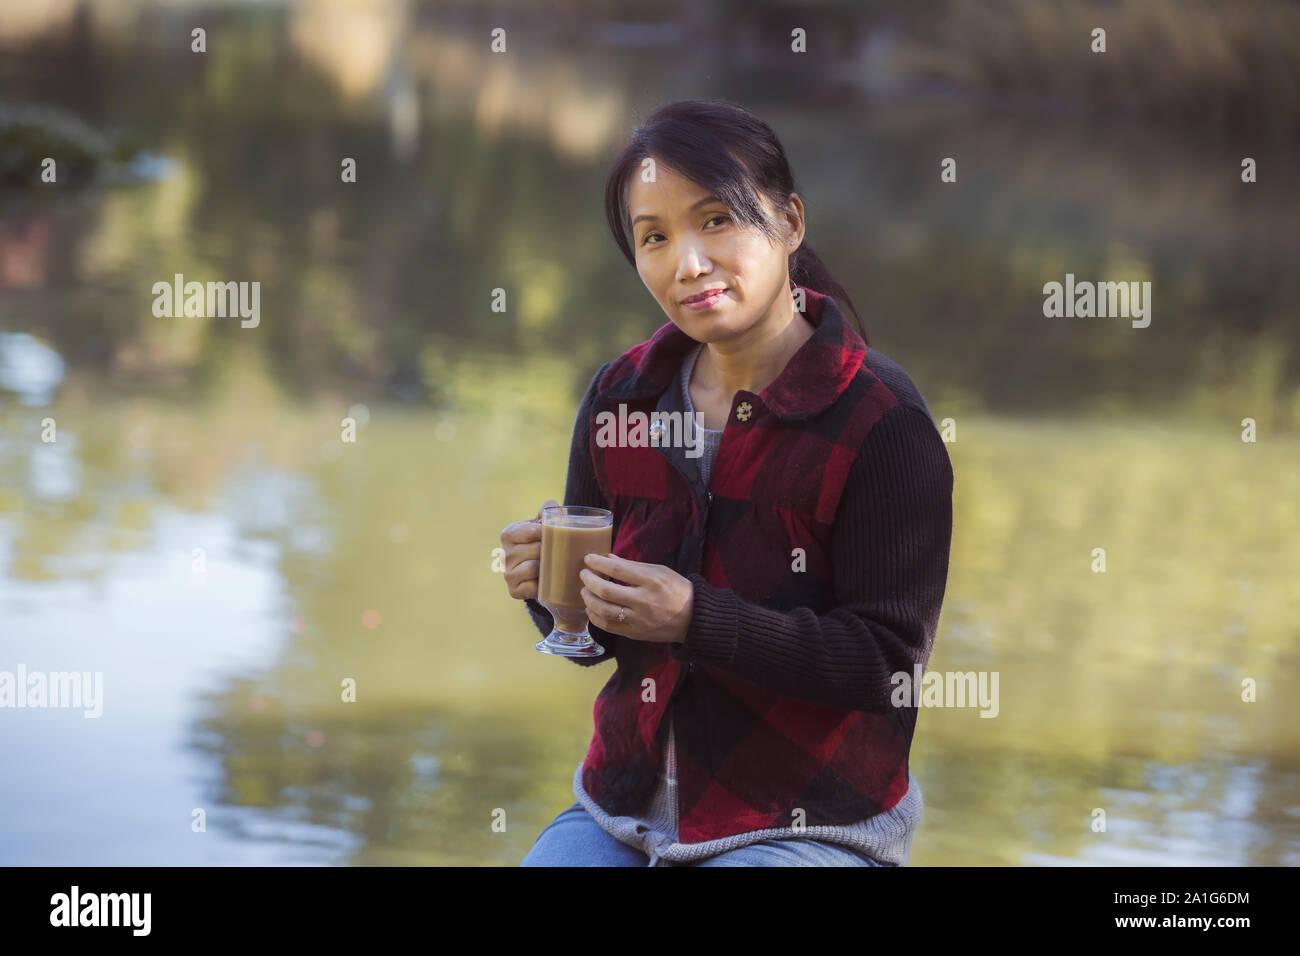 A korean woman enjoys a cup of coffee on a fall day in Spokane, Washington. Stock Photo